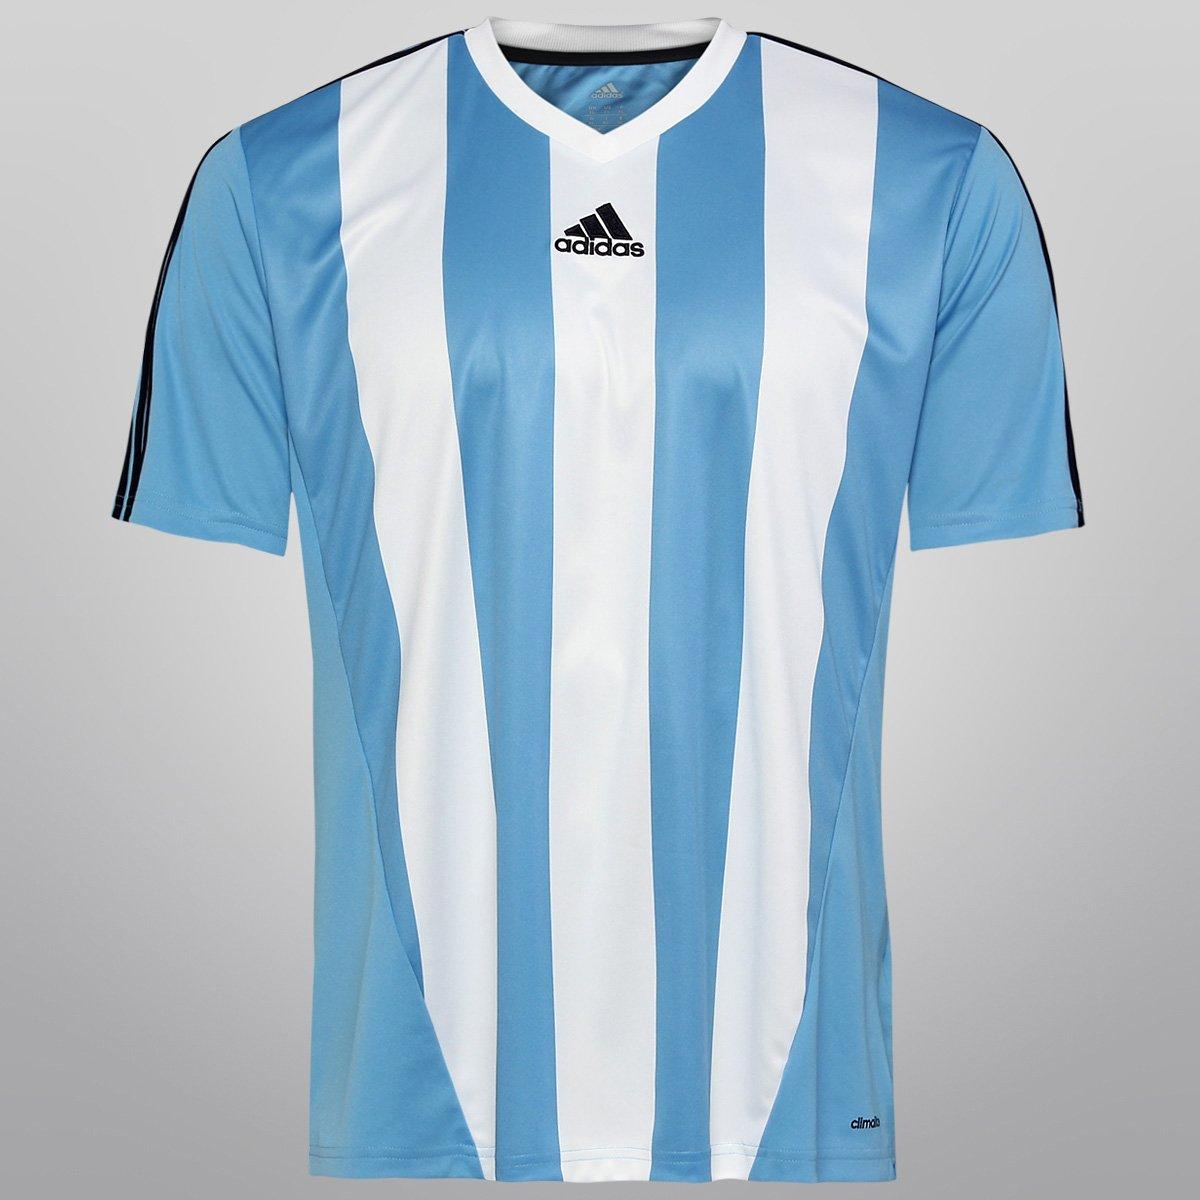 eb59d8a253c24 Camisa Adidas Inspired Masculina - Compre Agora